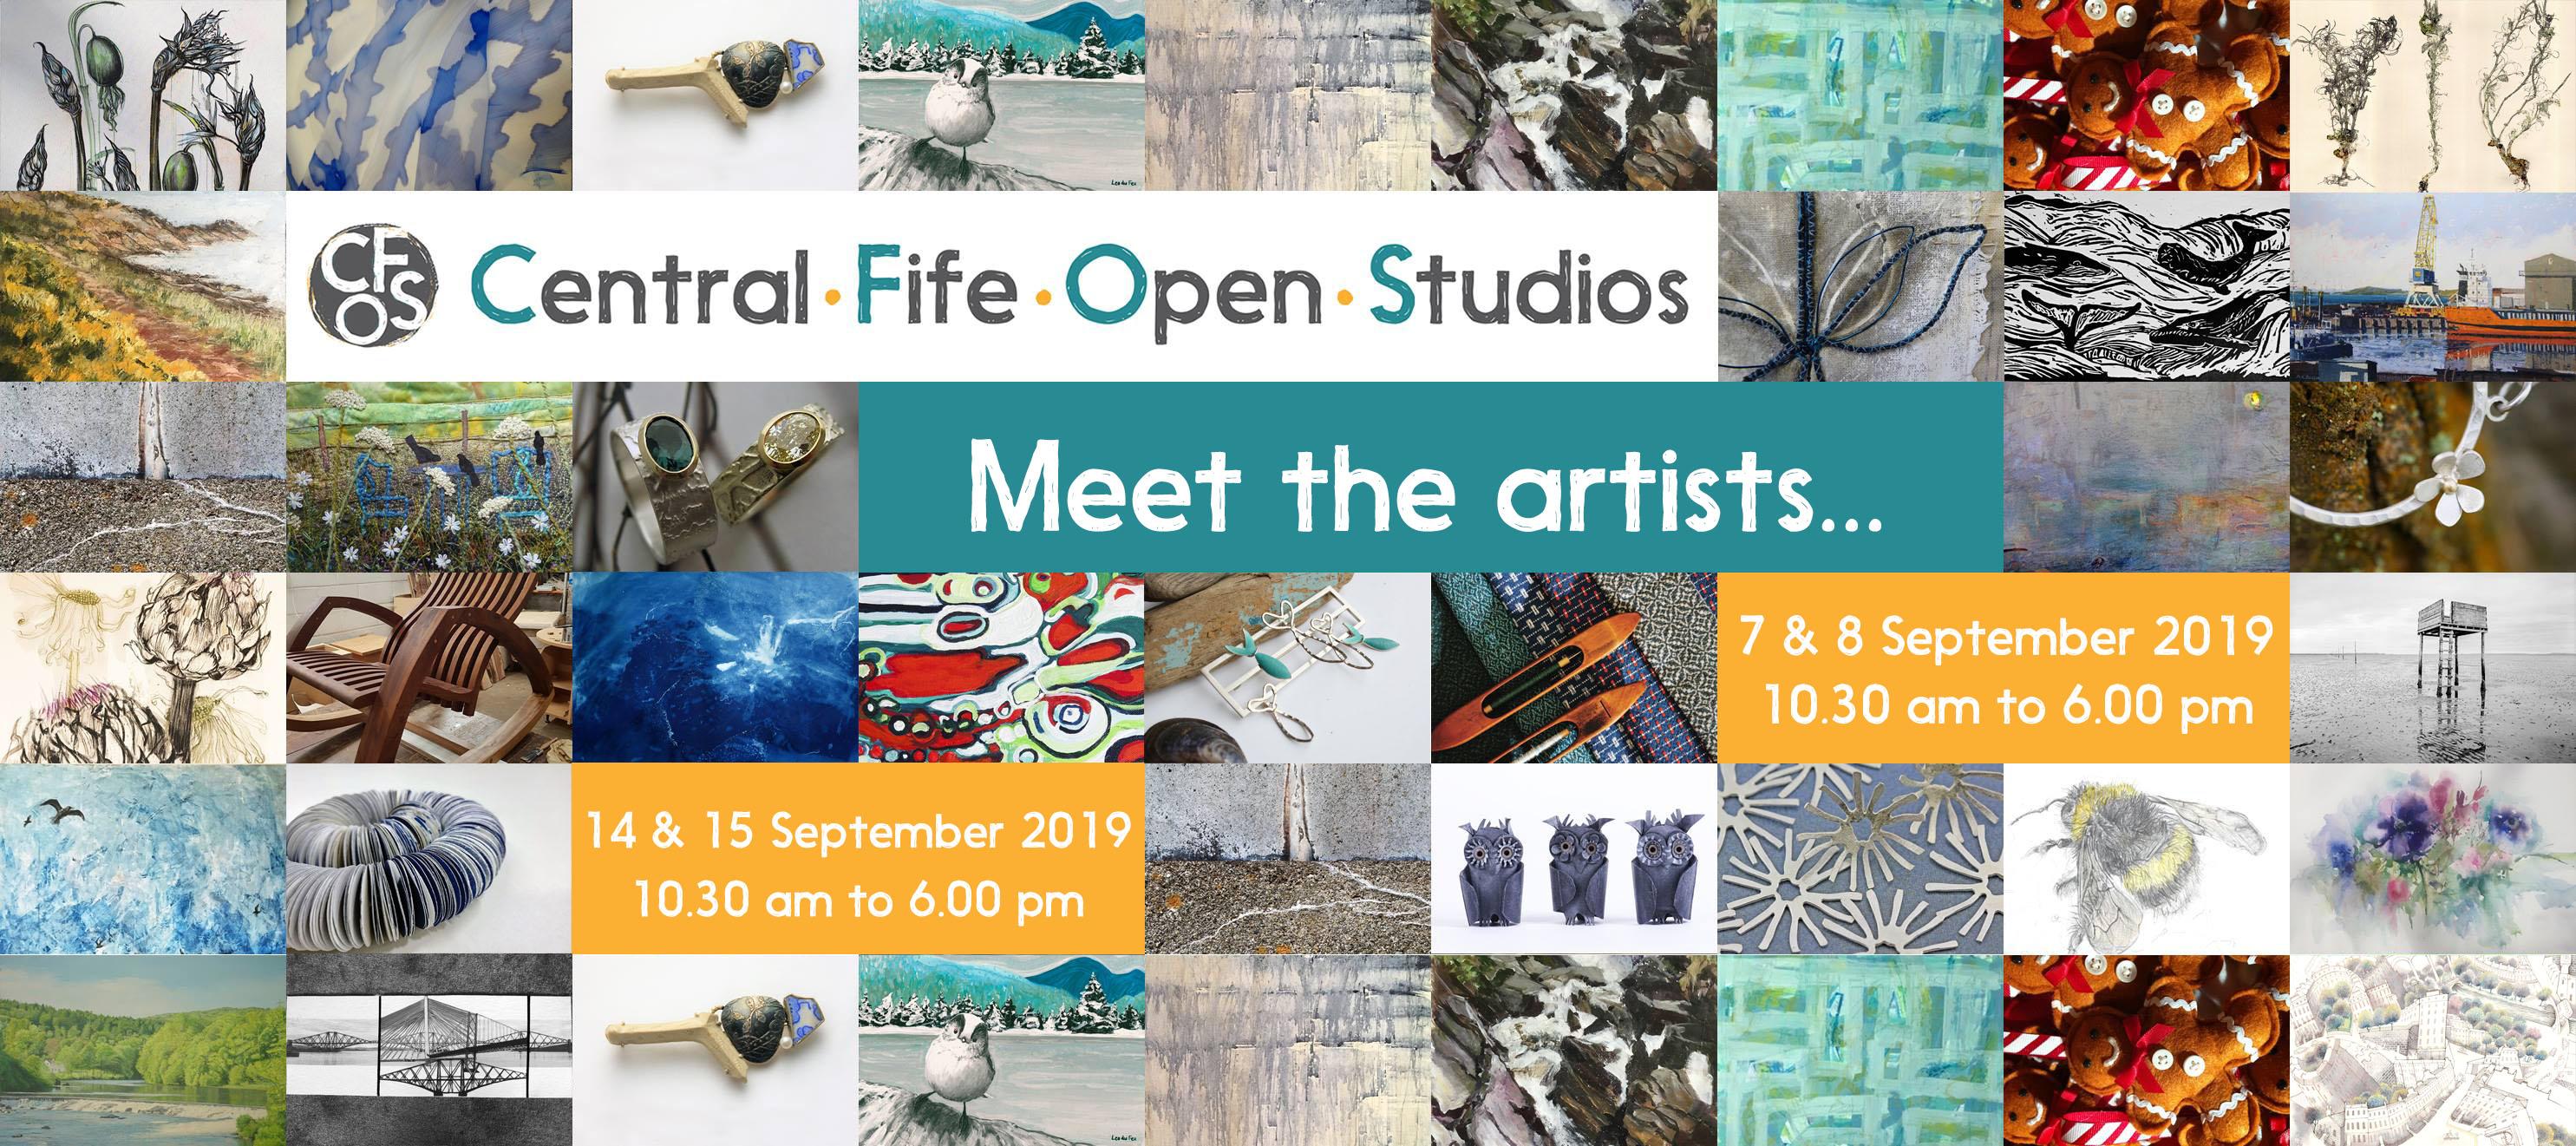 Central Fife Open Studios